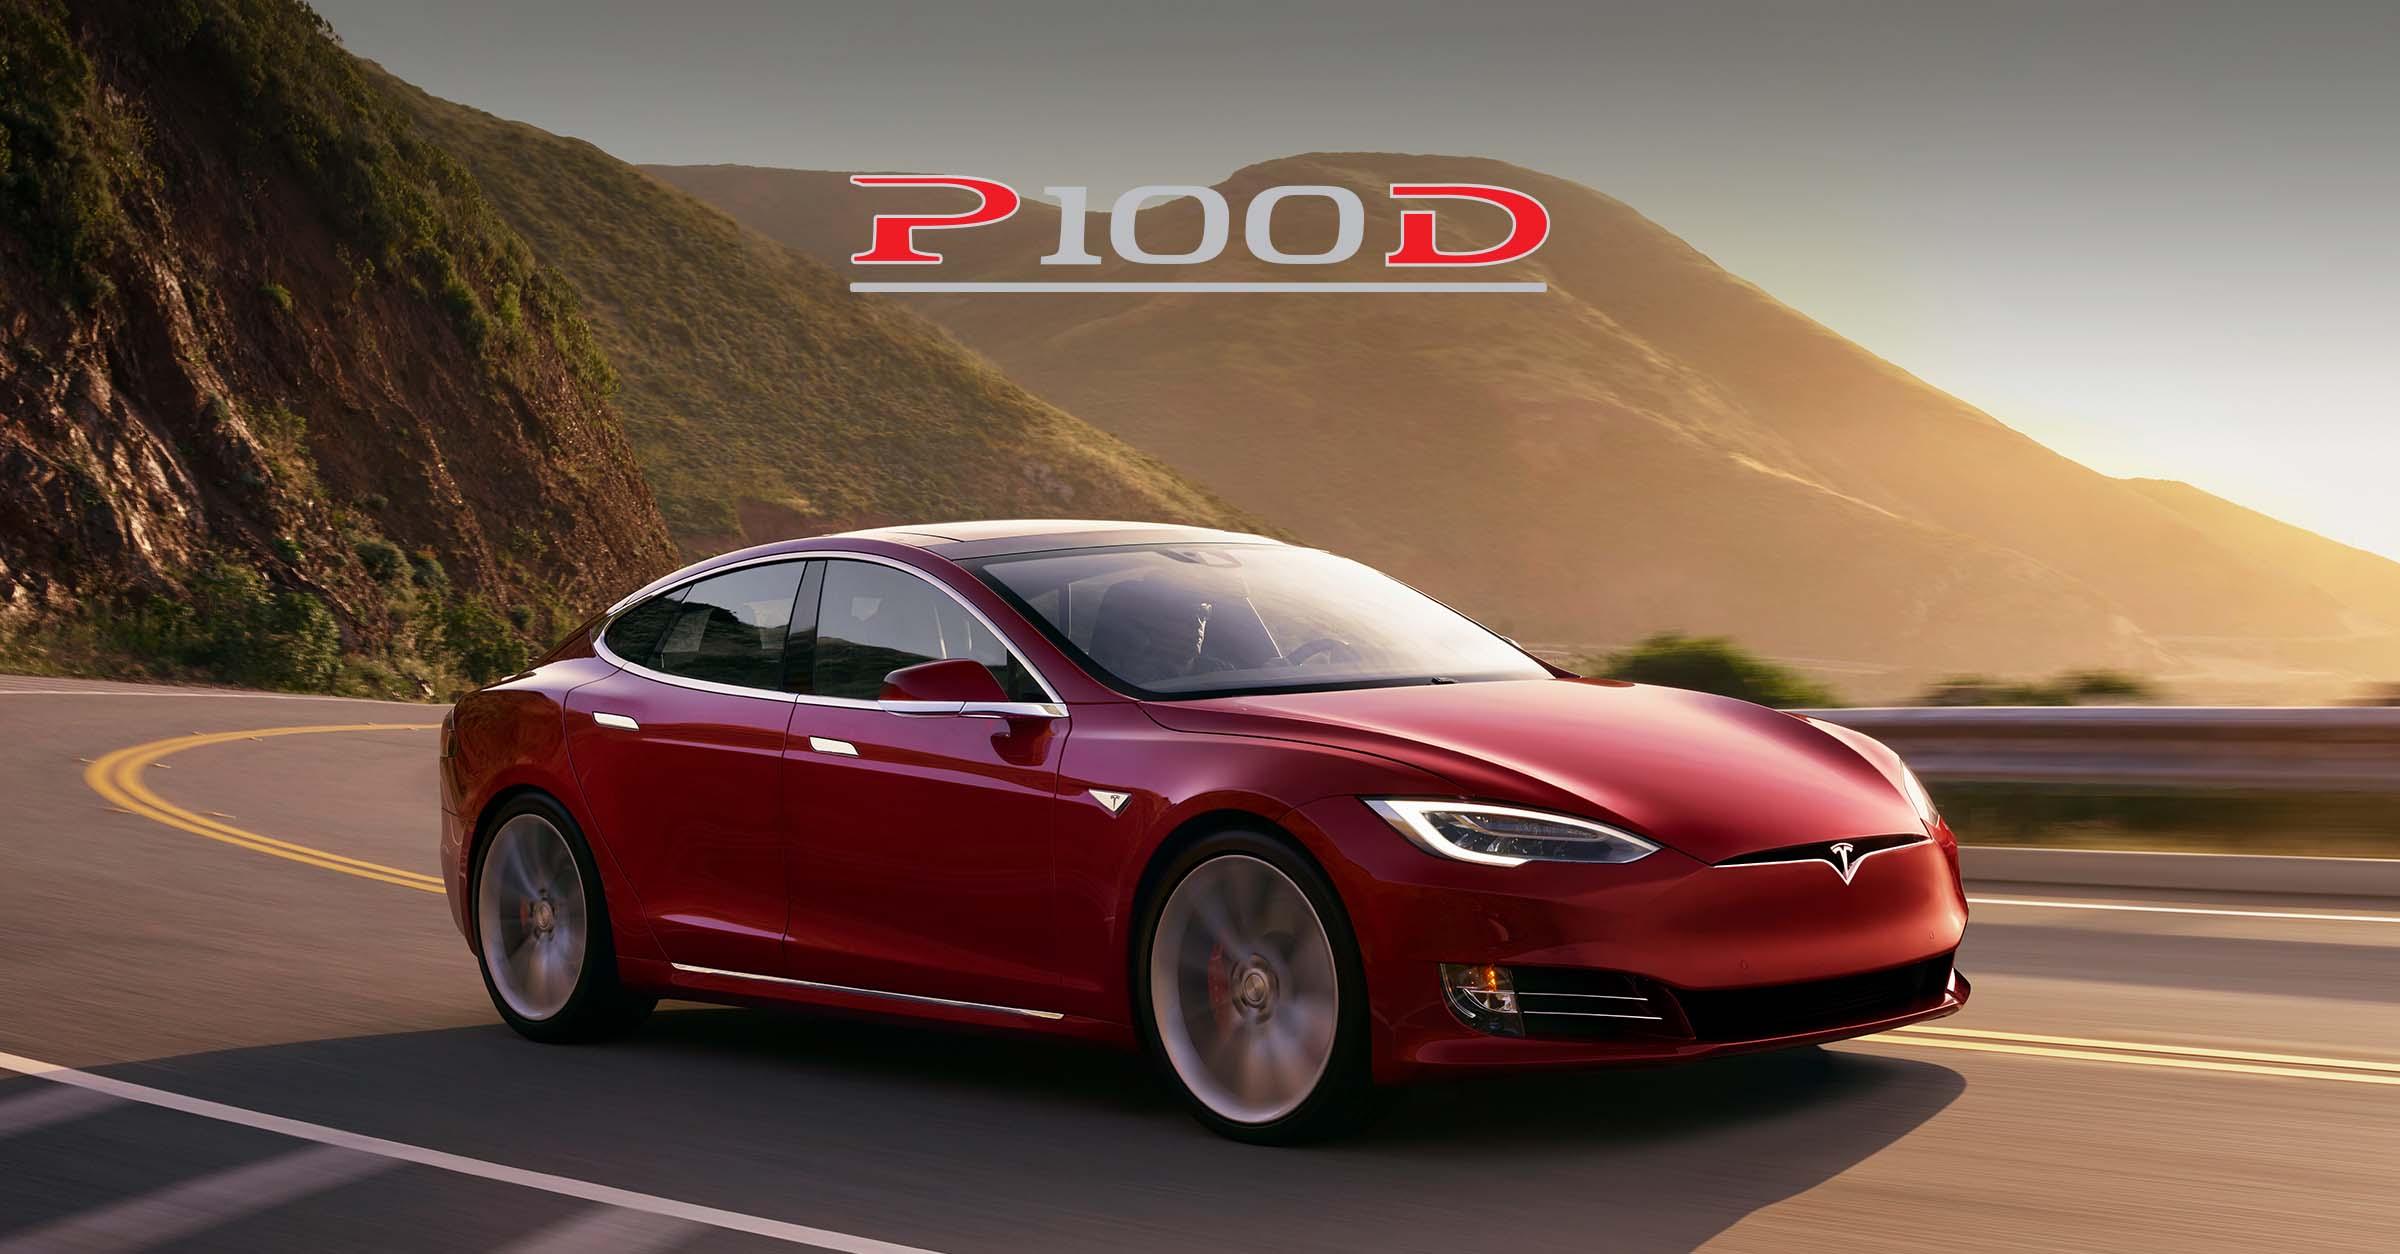 Images of Tesla Model S P100D